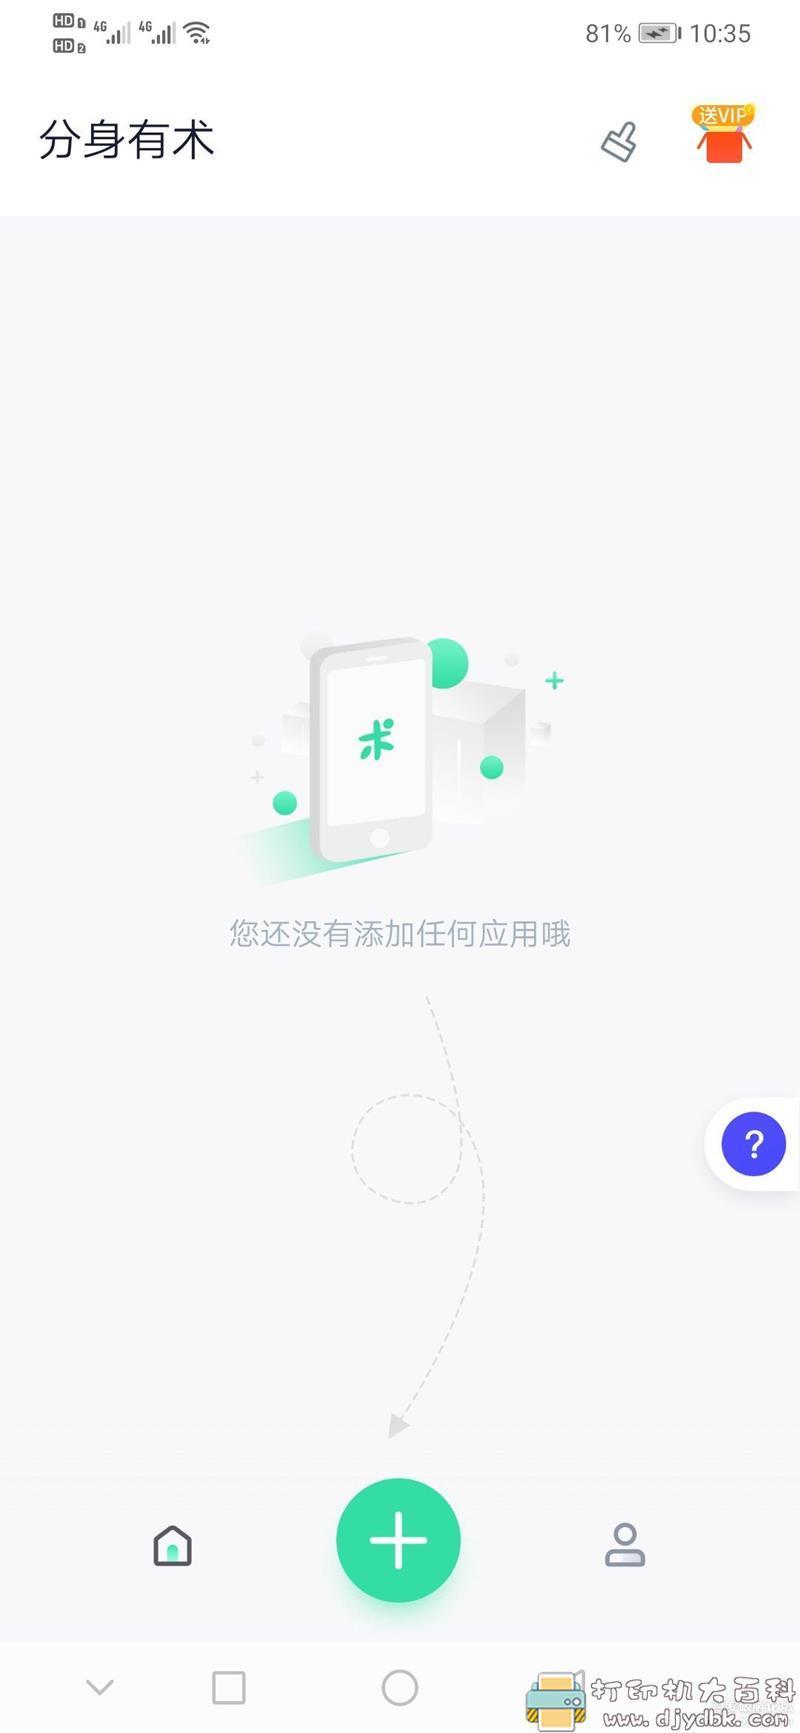 [Android]安卓免root多开软件,支持华为手机 配图 No.2